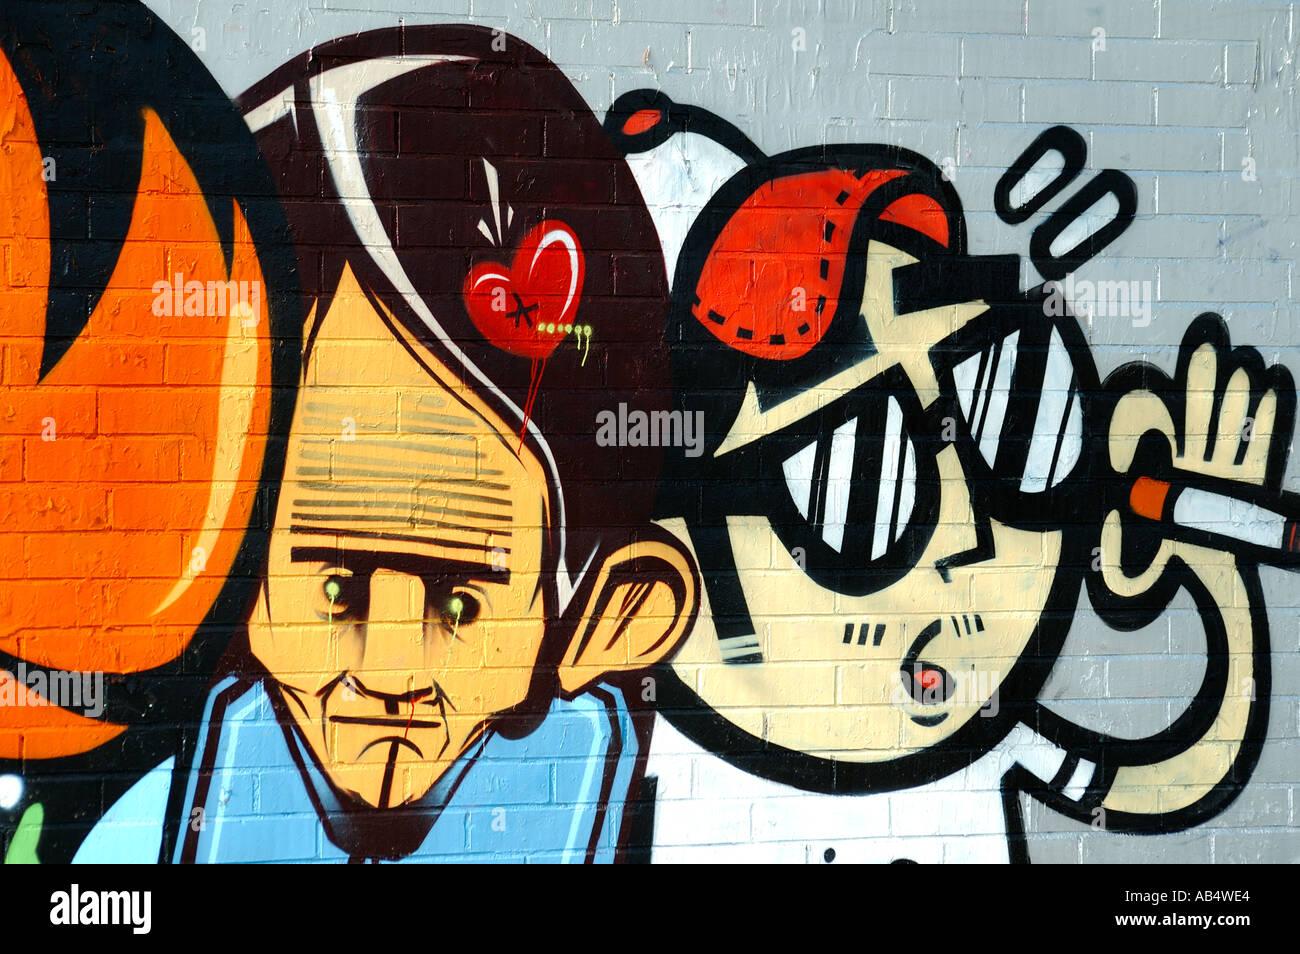 Graffiti wall barcelona - Graffiti On A Brick Wall Barcelona Spain